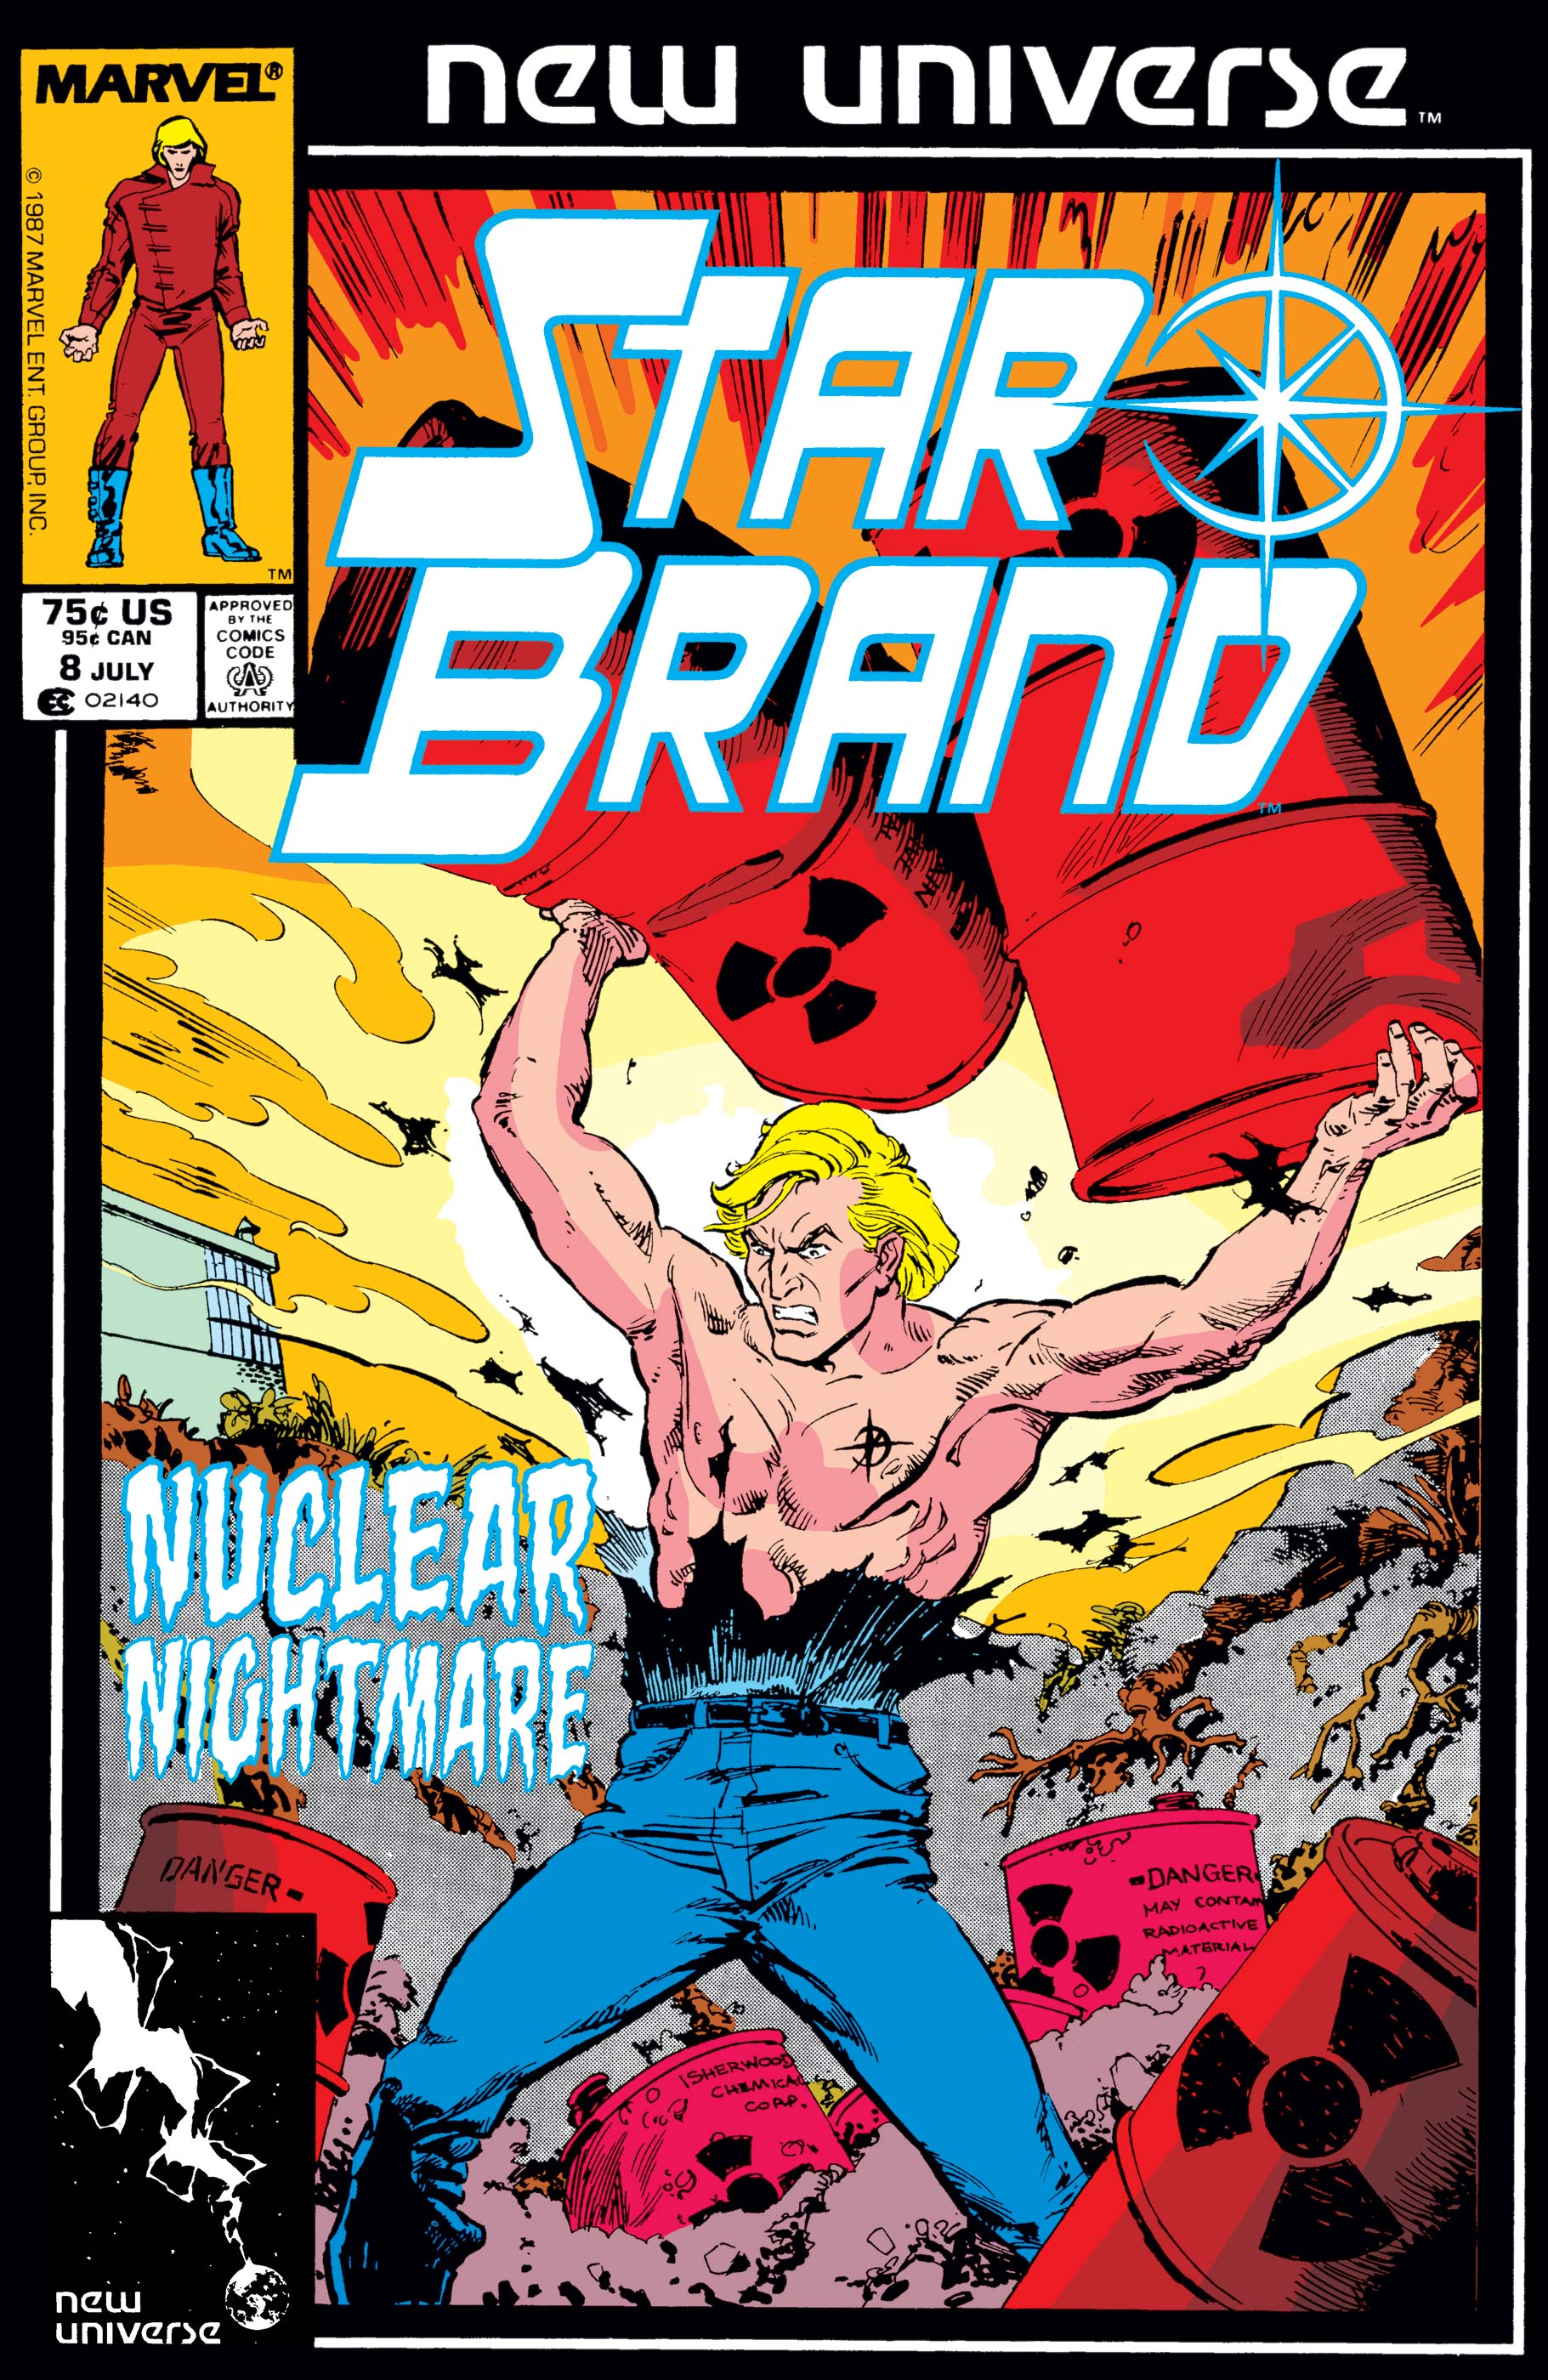 Star Brand (1986) #8